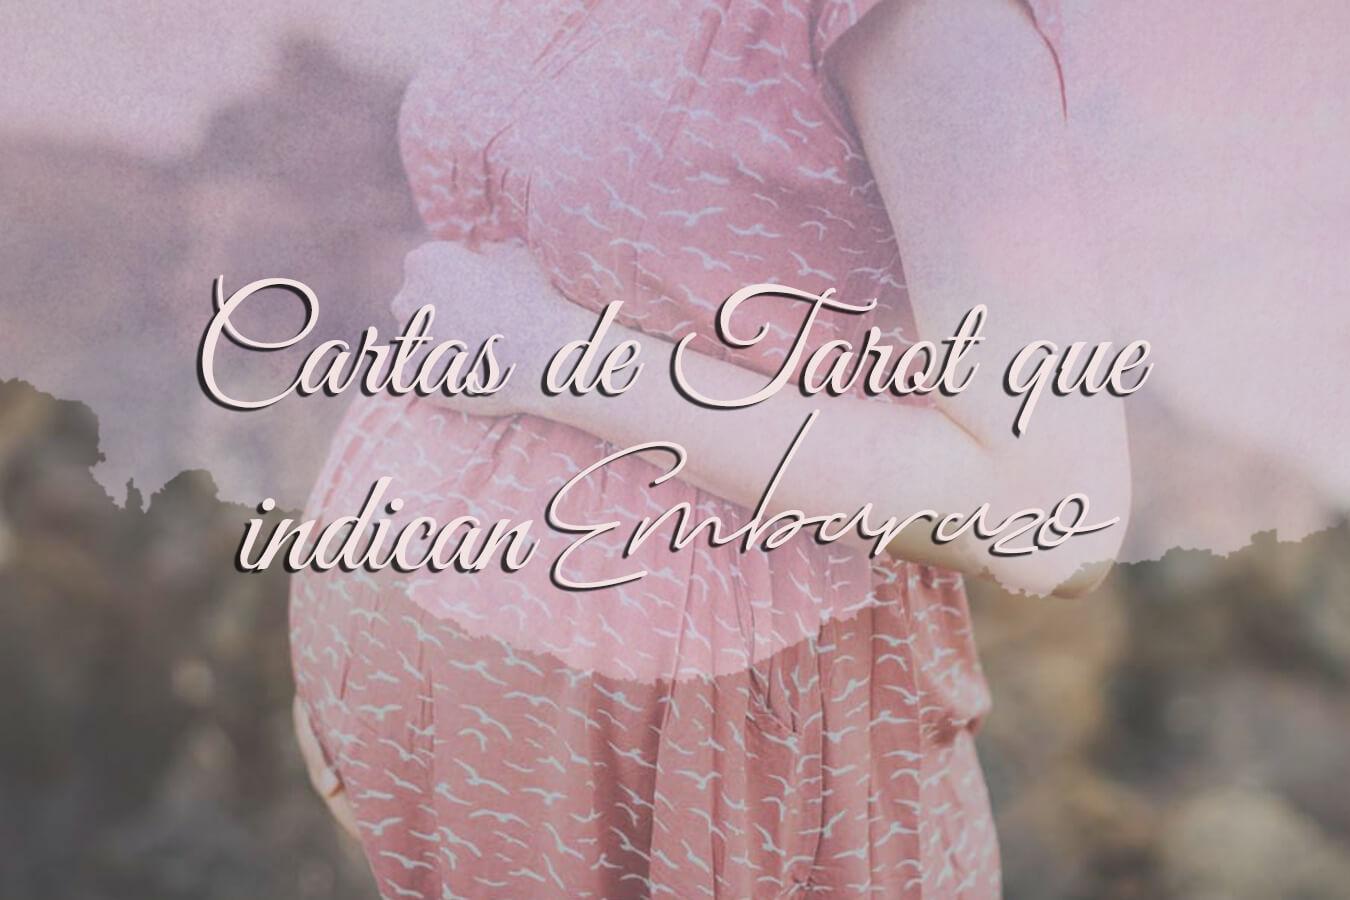 Cartas de tarot que indican embarazo